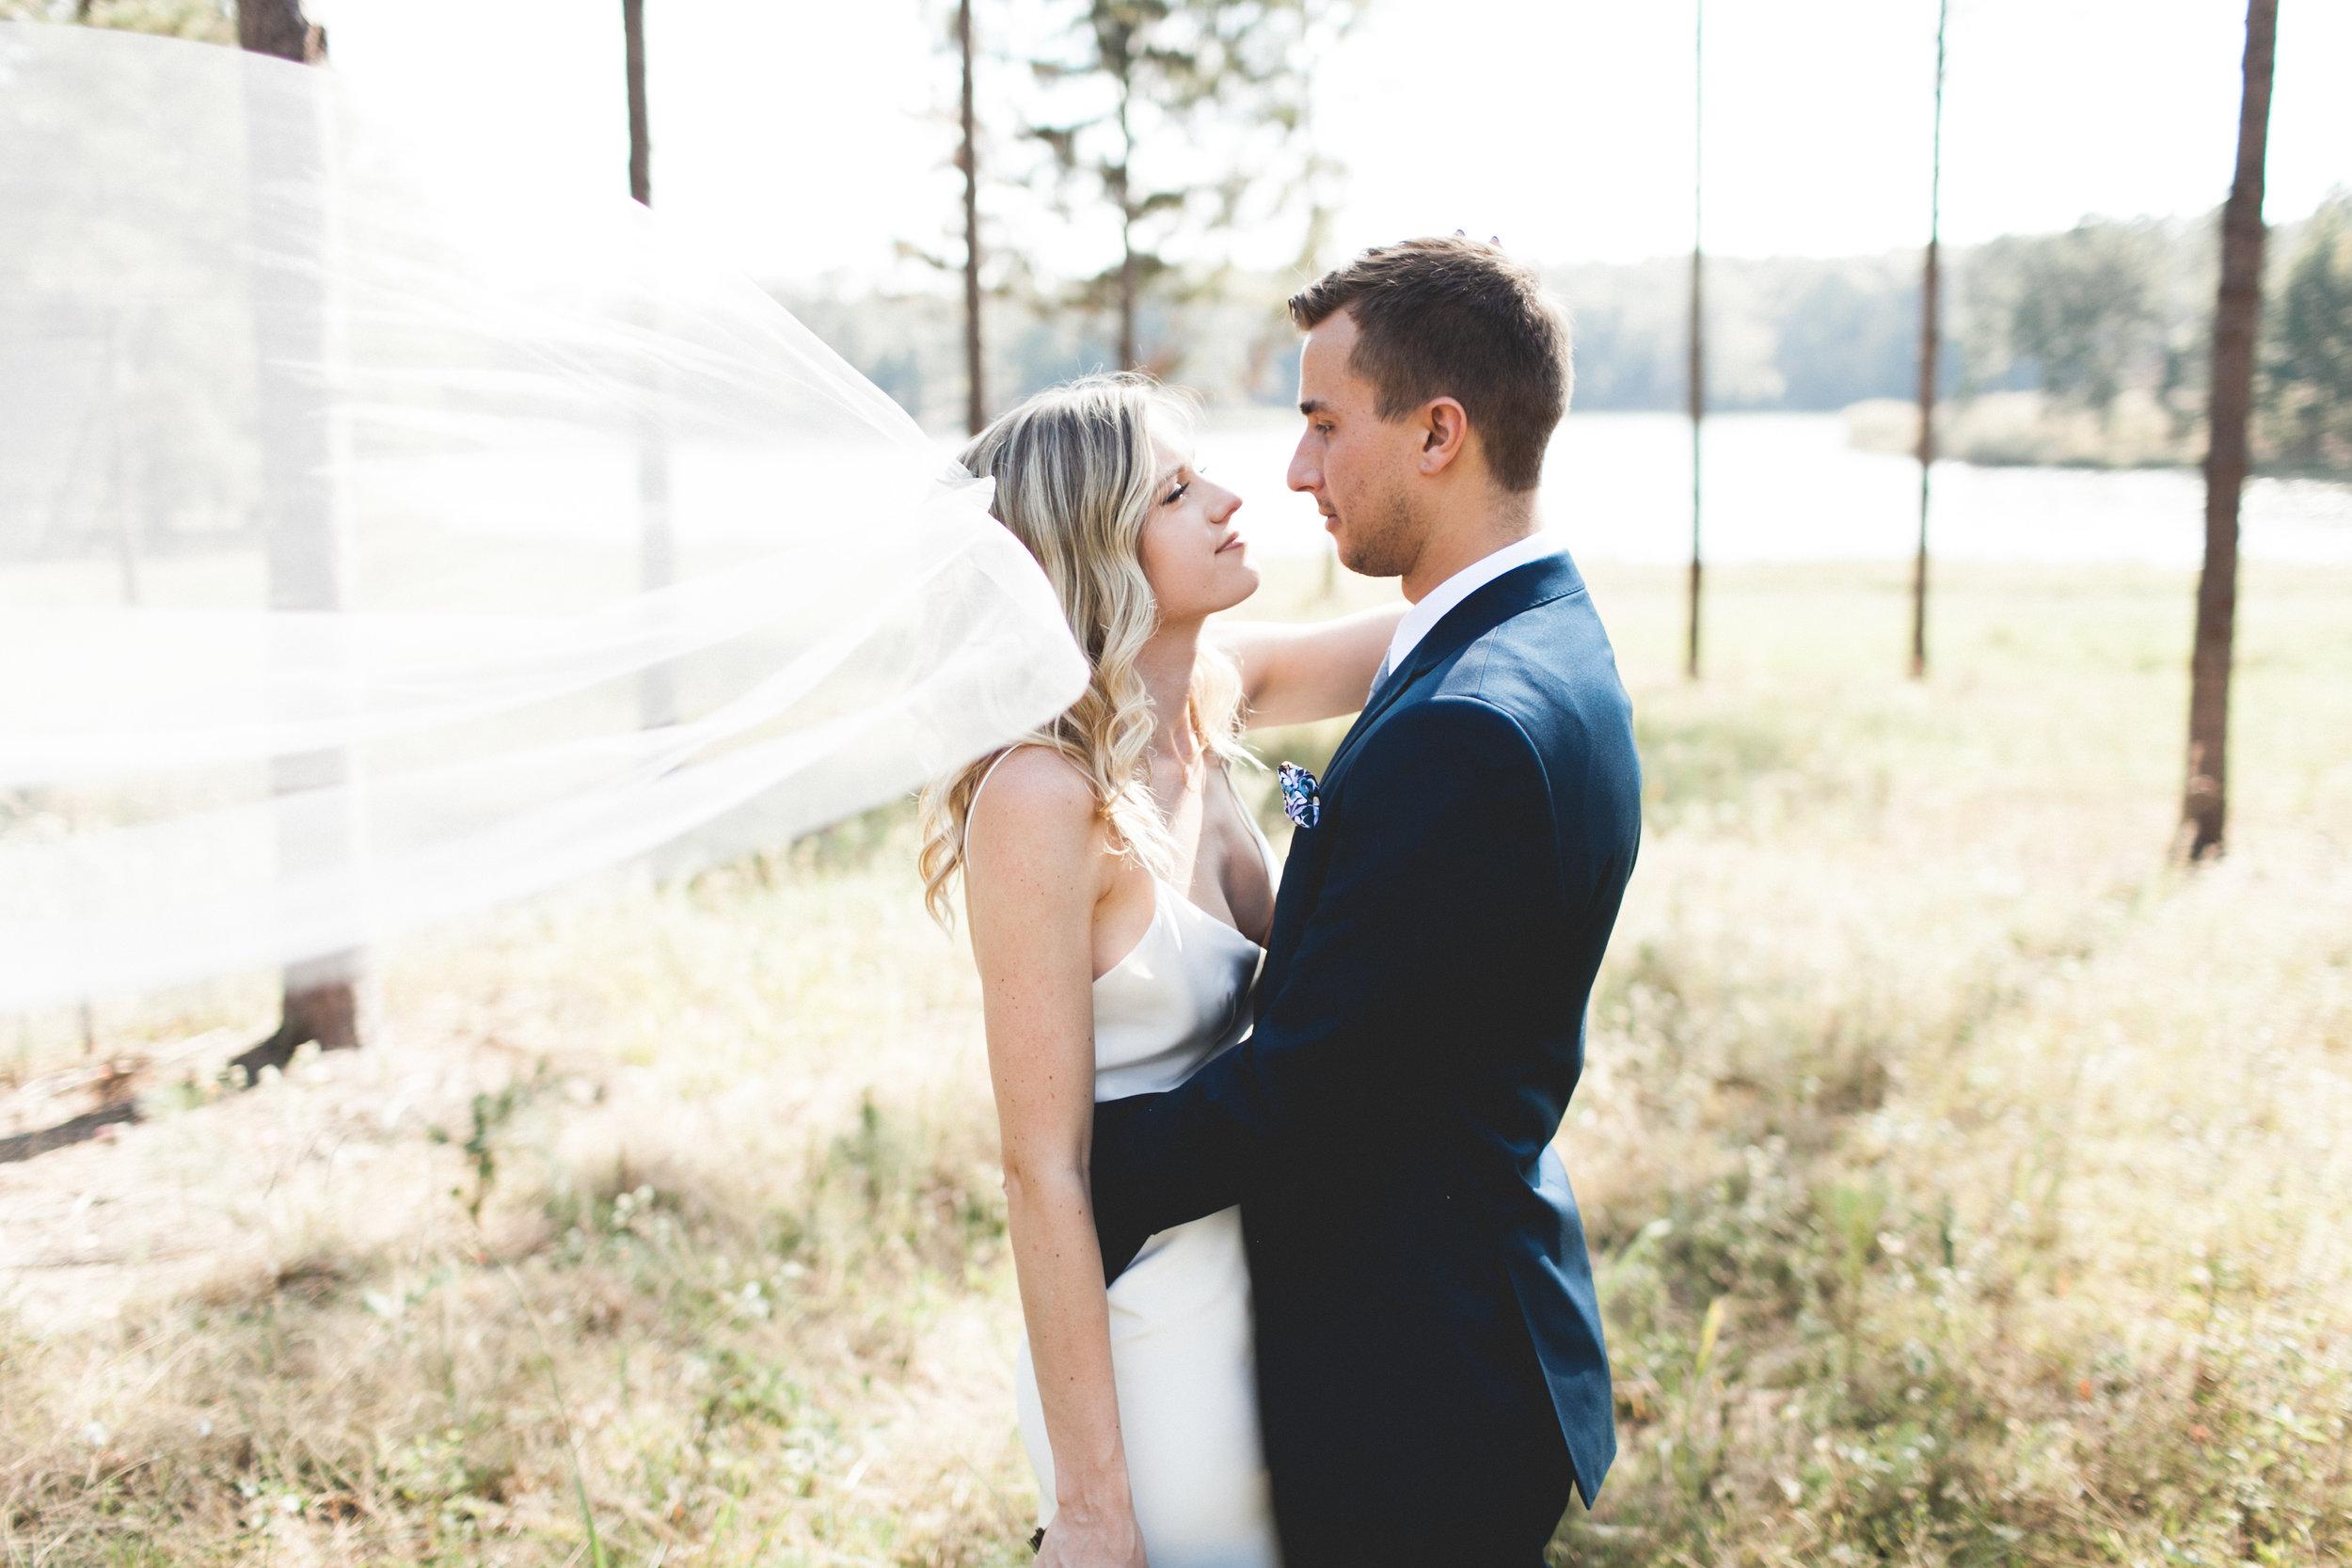 Beth_Garr_Couple Portraits-110.jpg